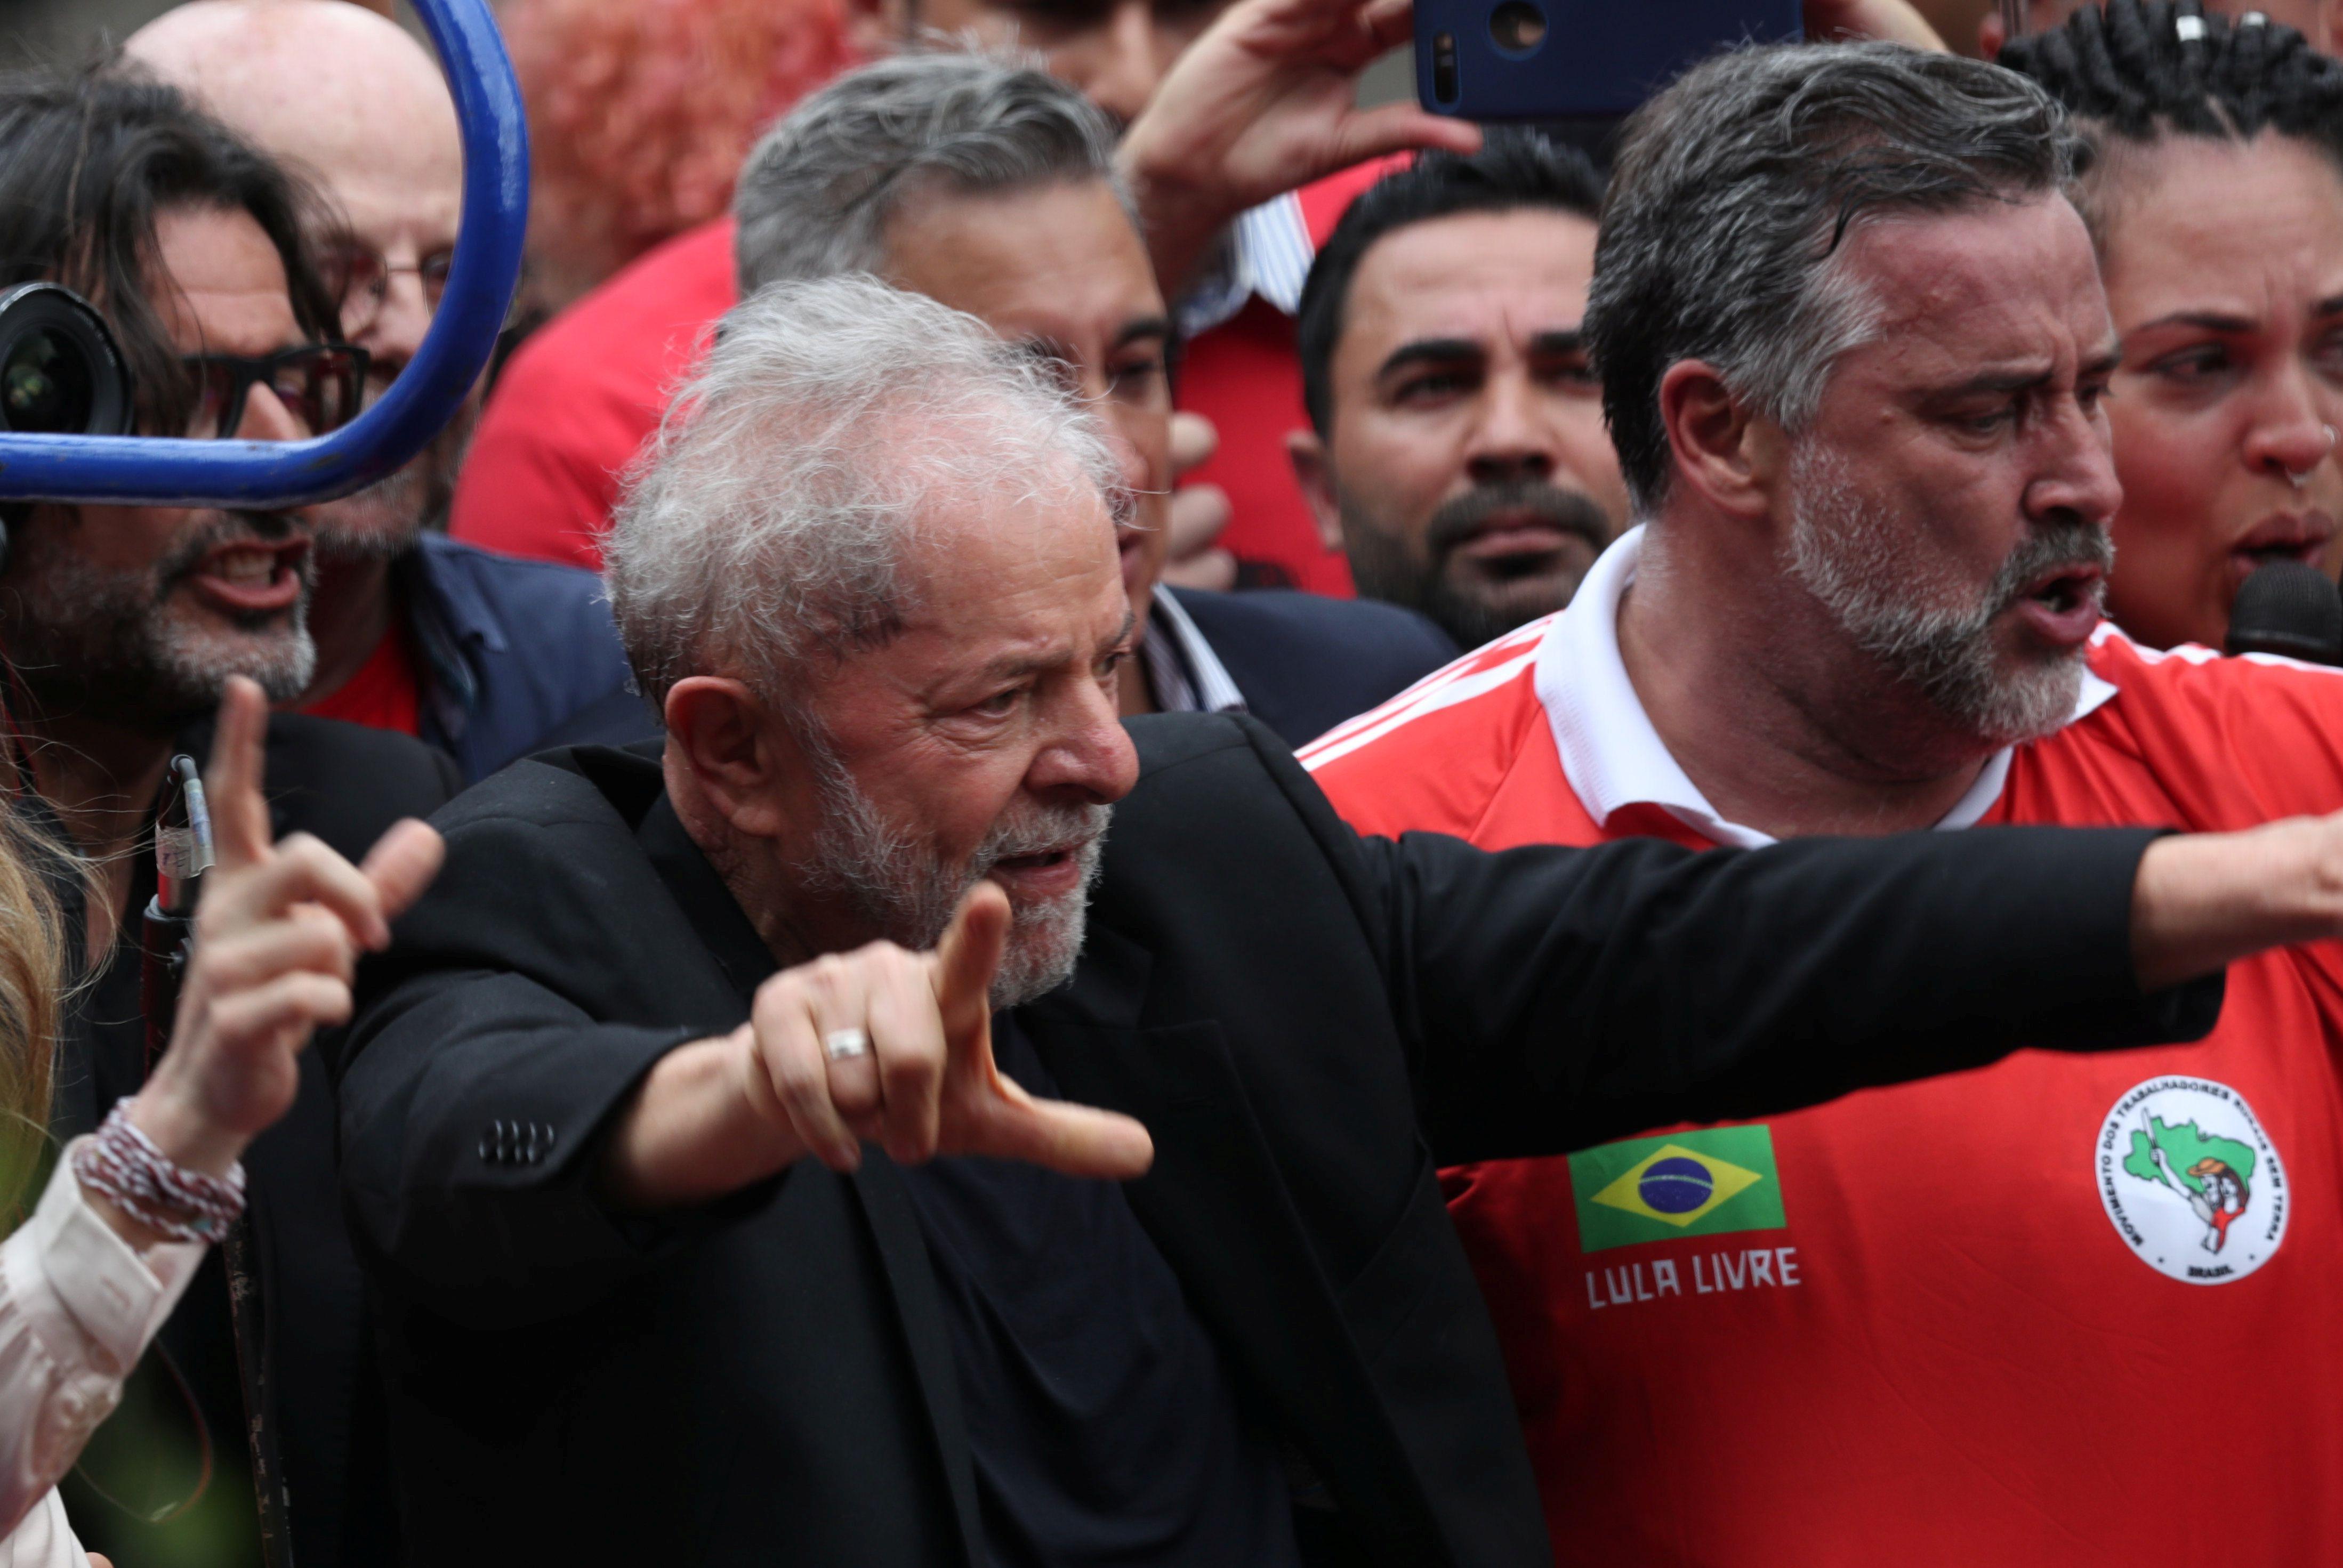 Former Brazilian President Luiz Inacio Lula da Silva arrives to deliver a speech after being released from prison, in Sao Bernardo do Campo, Brazil November 9, 2019. REUTERS/Amanda Perobelli